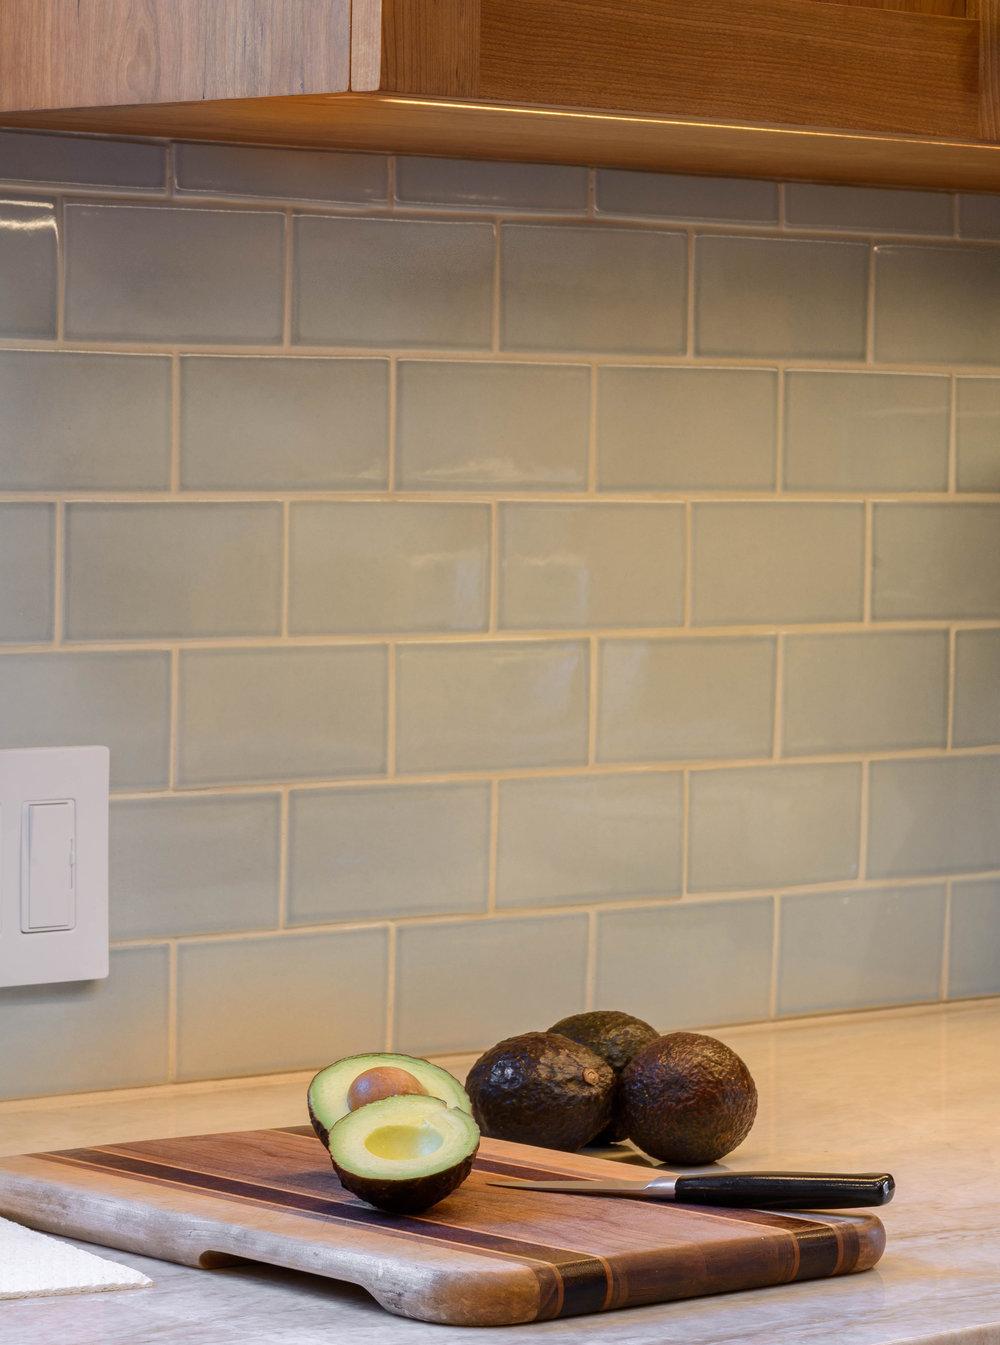 Kitchen stone counter with warm soft blue tile backsplash